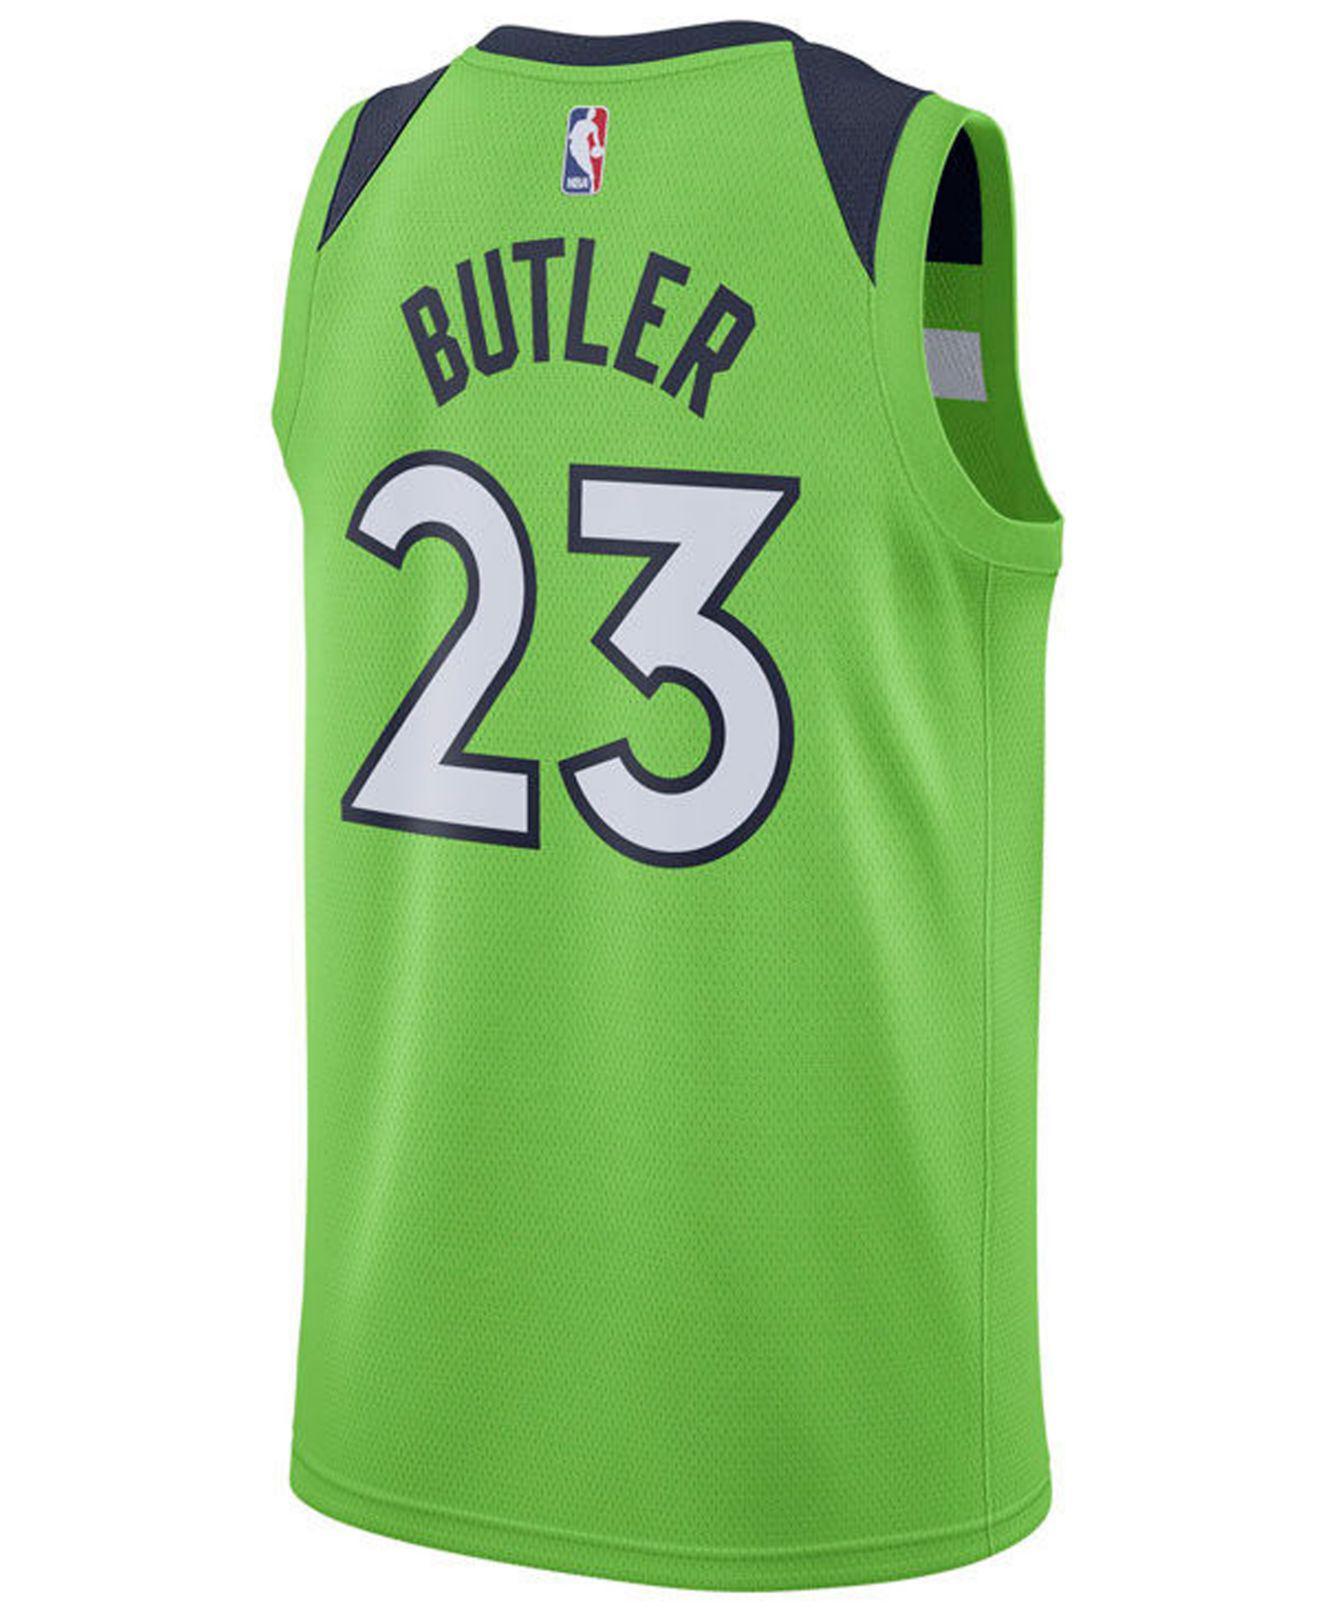 2377555b9a6 ... italy lyst nike jimmy butler minnesota timberwolves statement swingman  jersey in green for men save 58.064516129032256